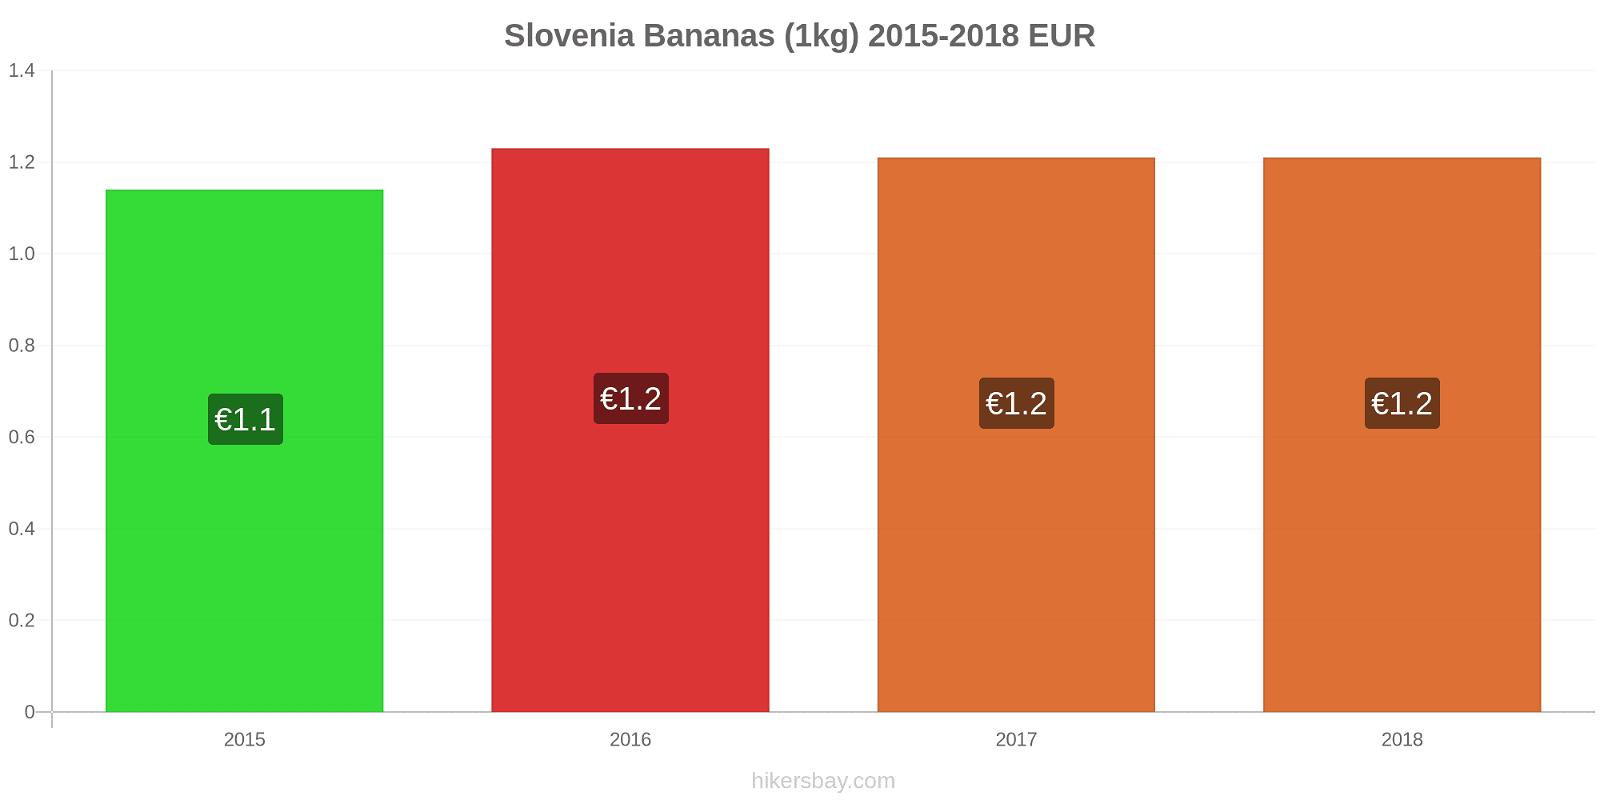 Slovenia price changes Bananas (1kg) hikersbay.com